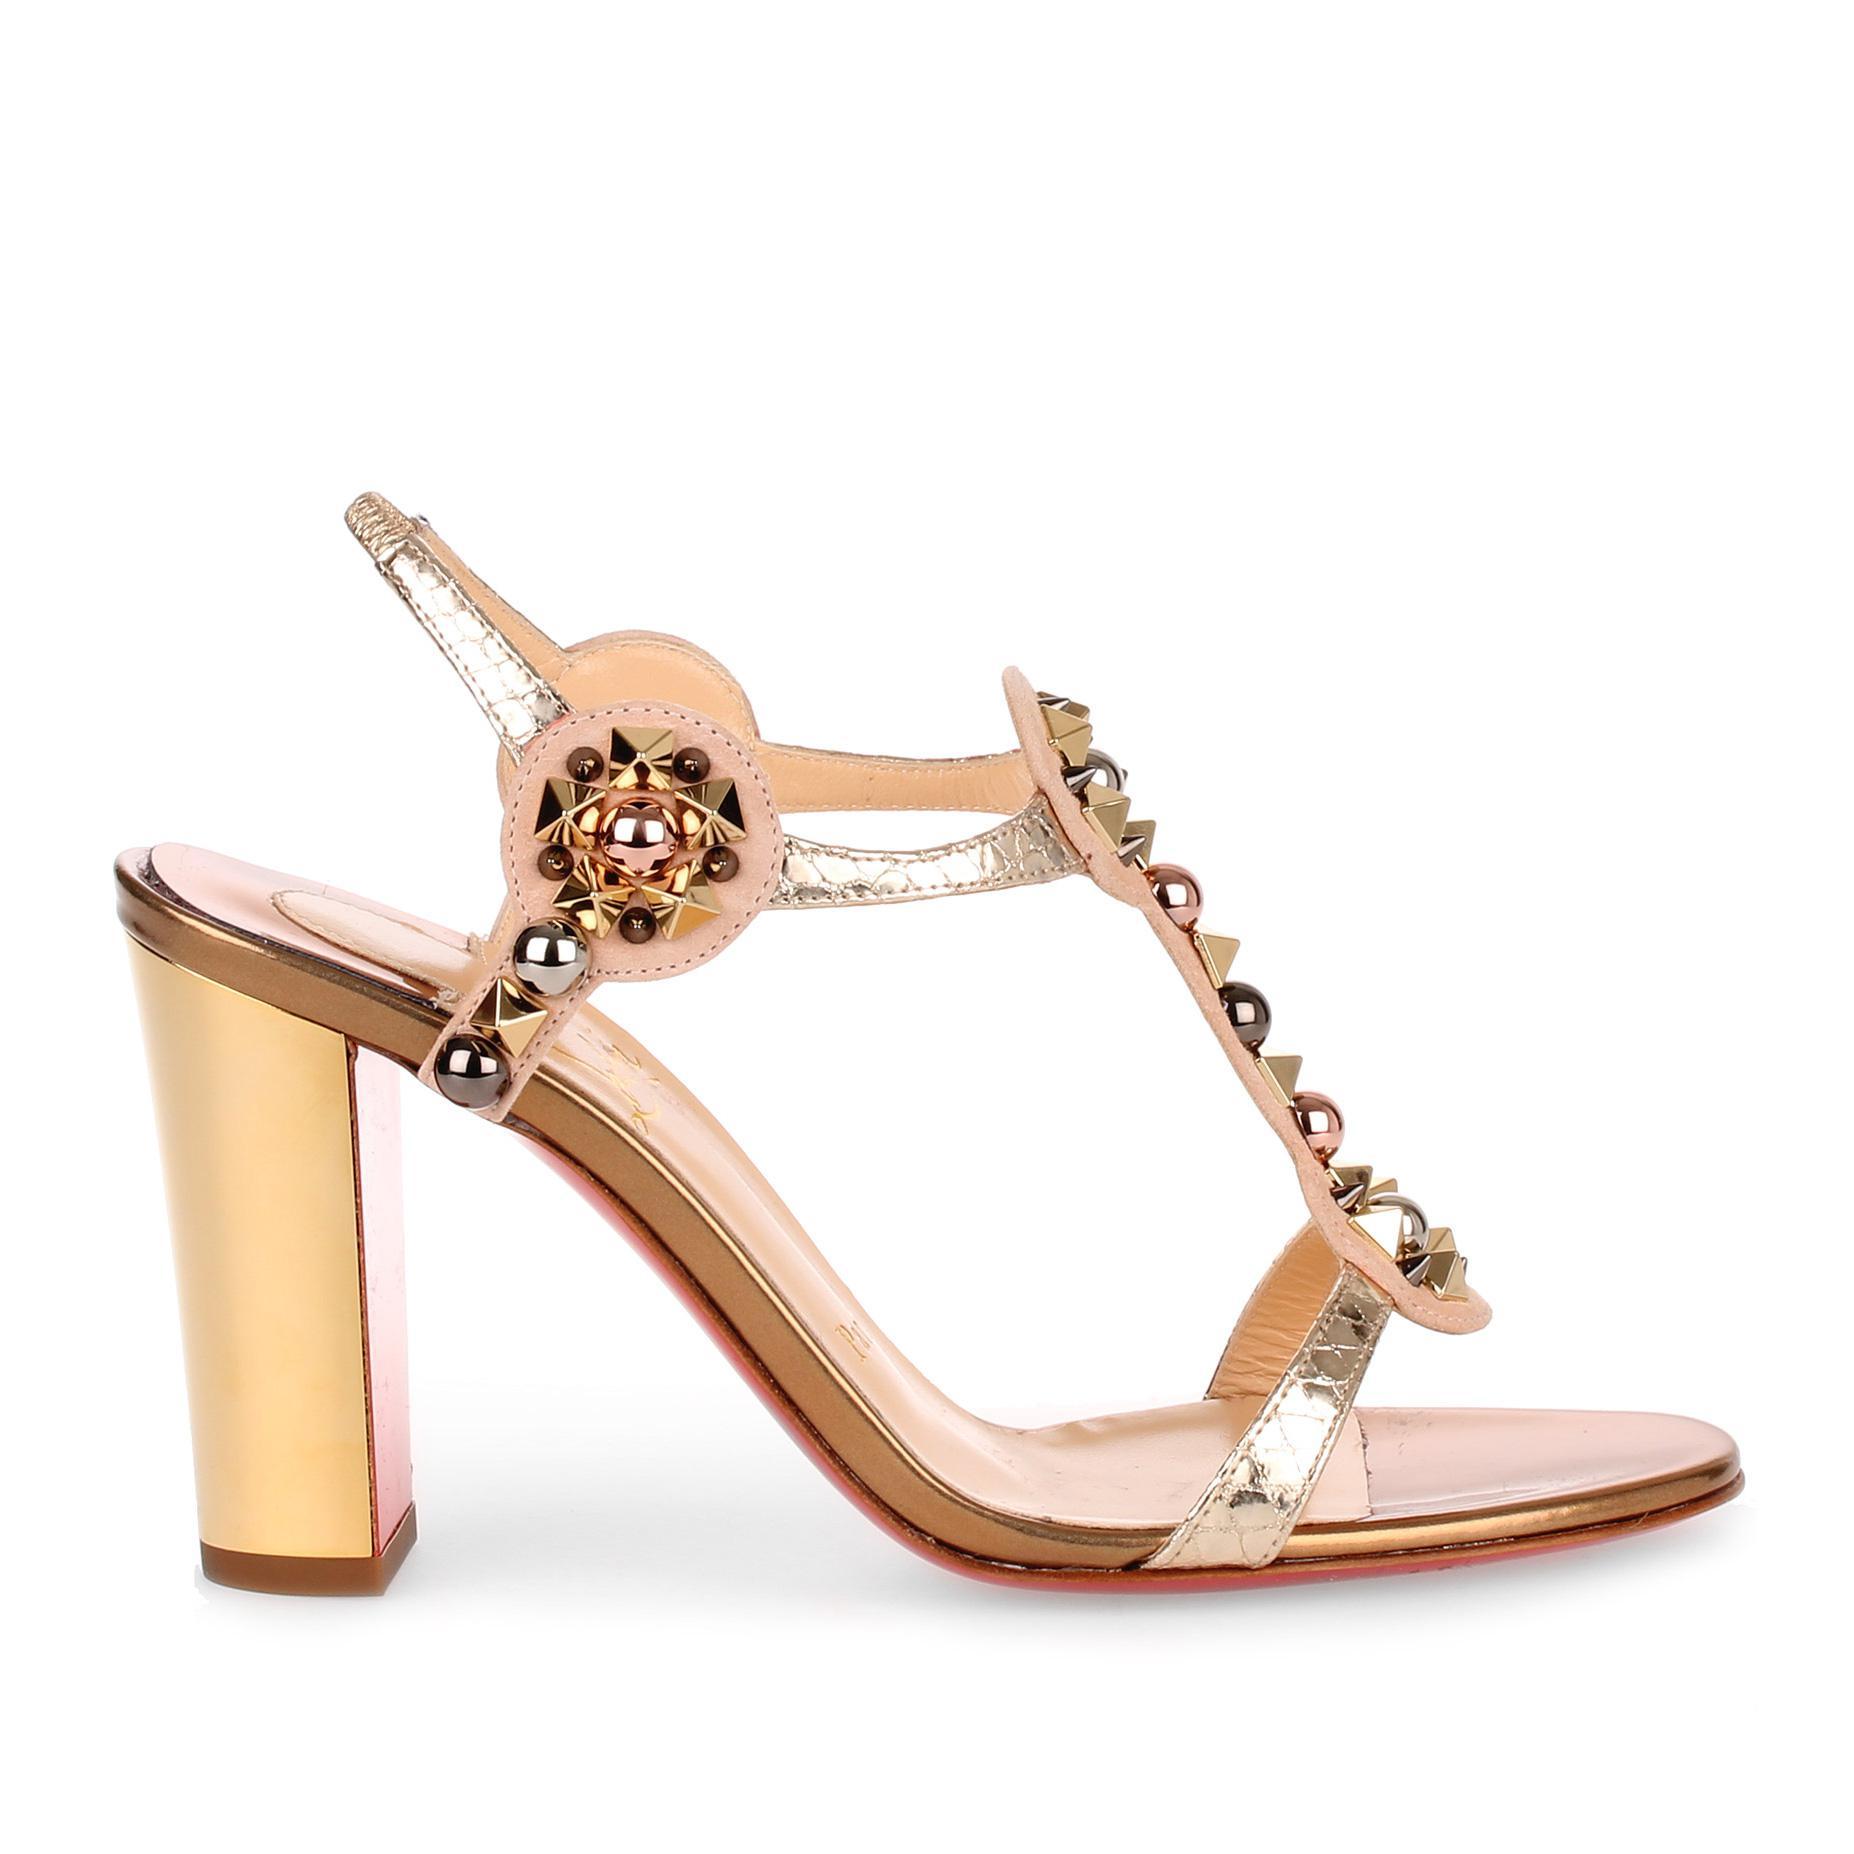 Kaleitop 85 metallic leather sandal Christian Louboutin In China Cheap Online Exclusive Online 3lma9Hyb